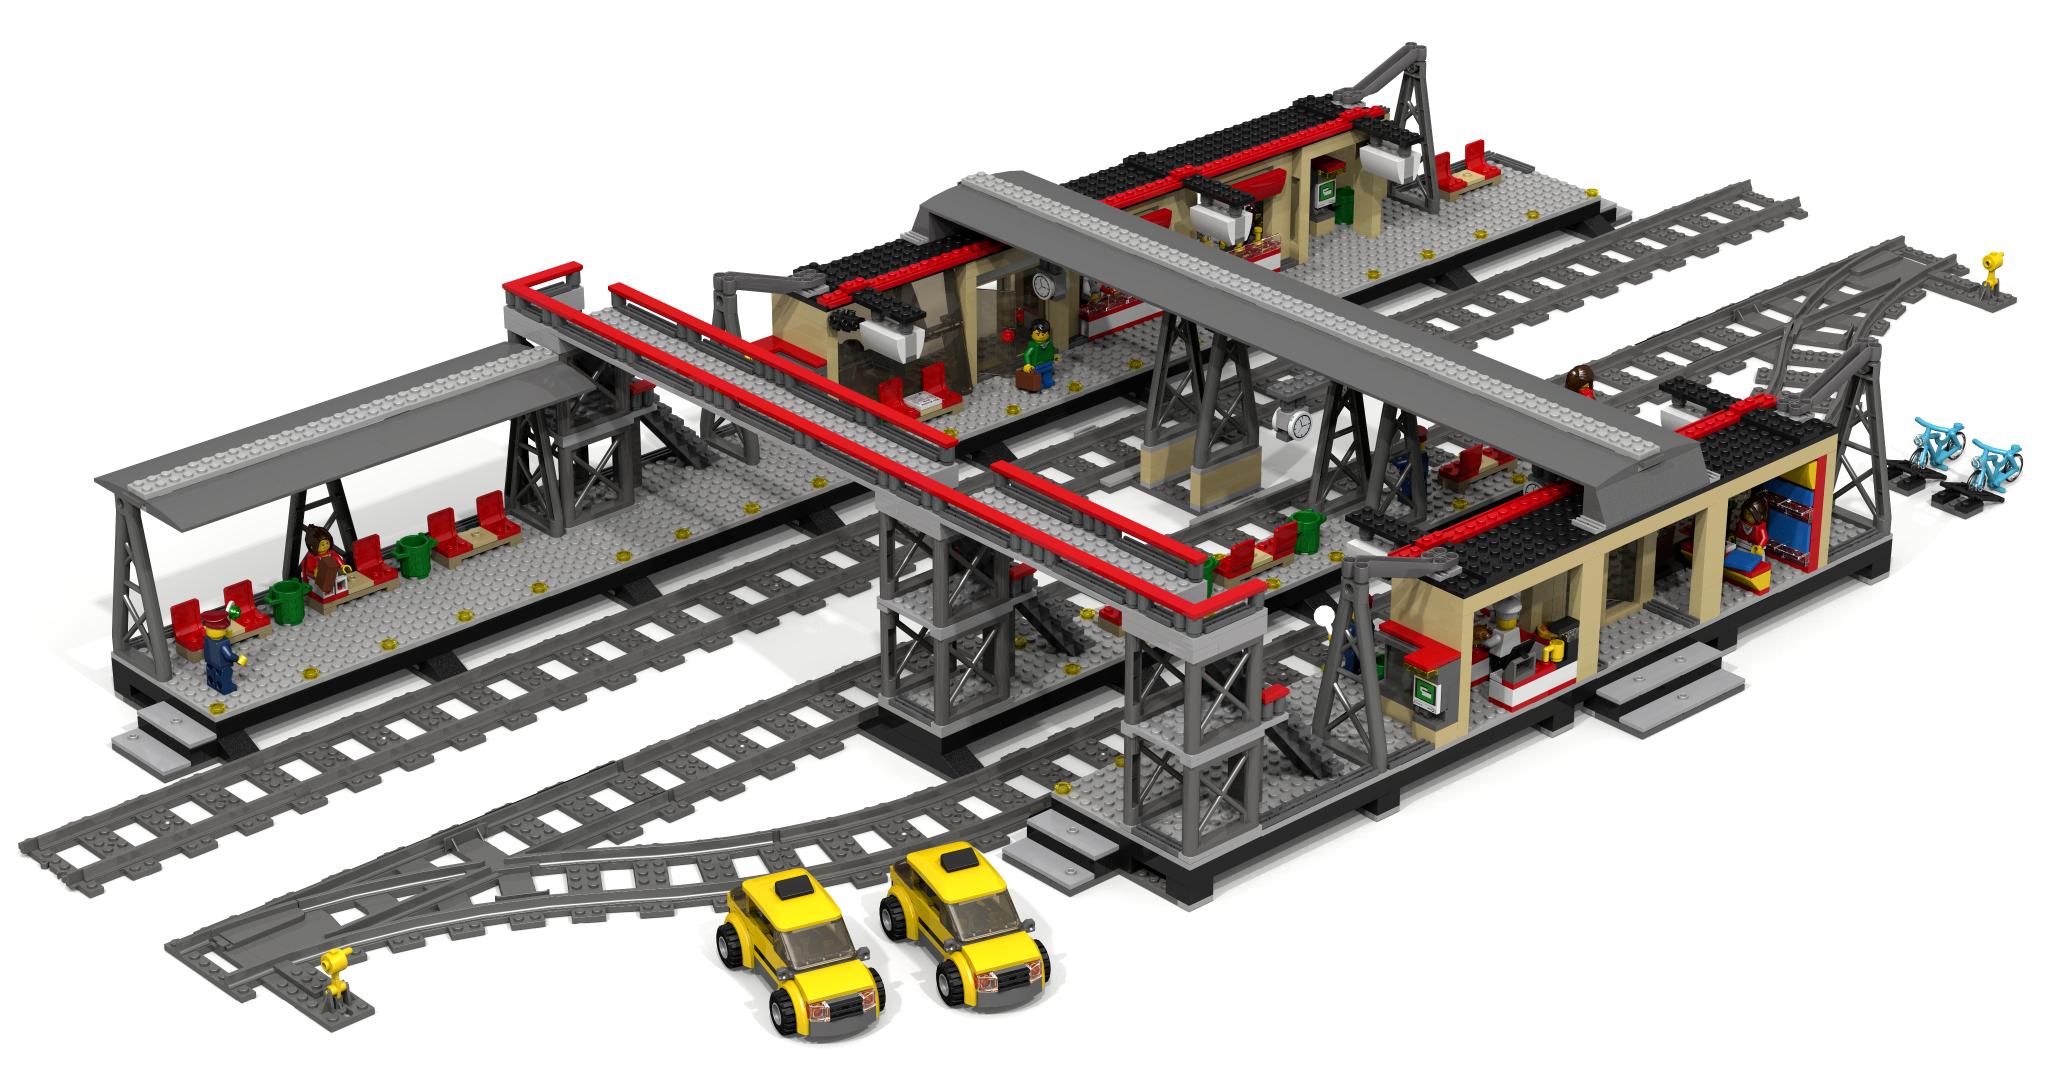 Lego Moc Train Station Instructions